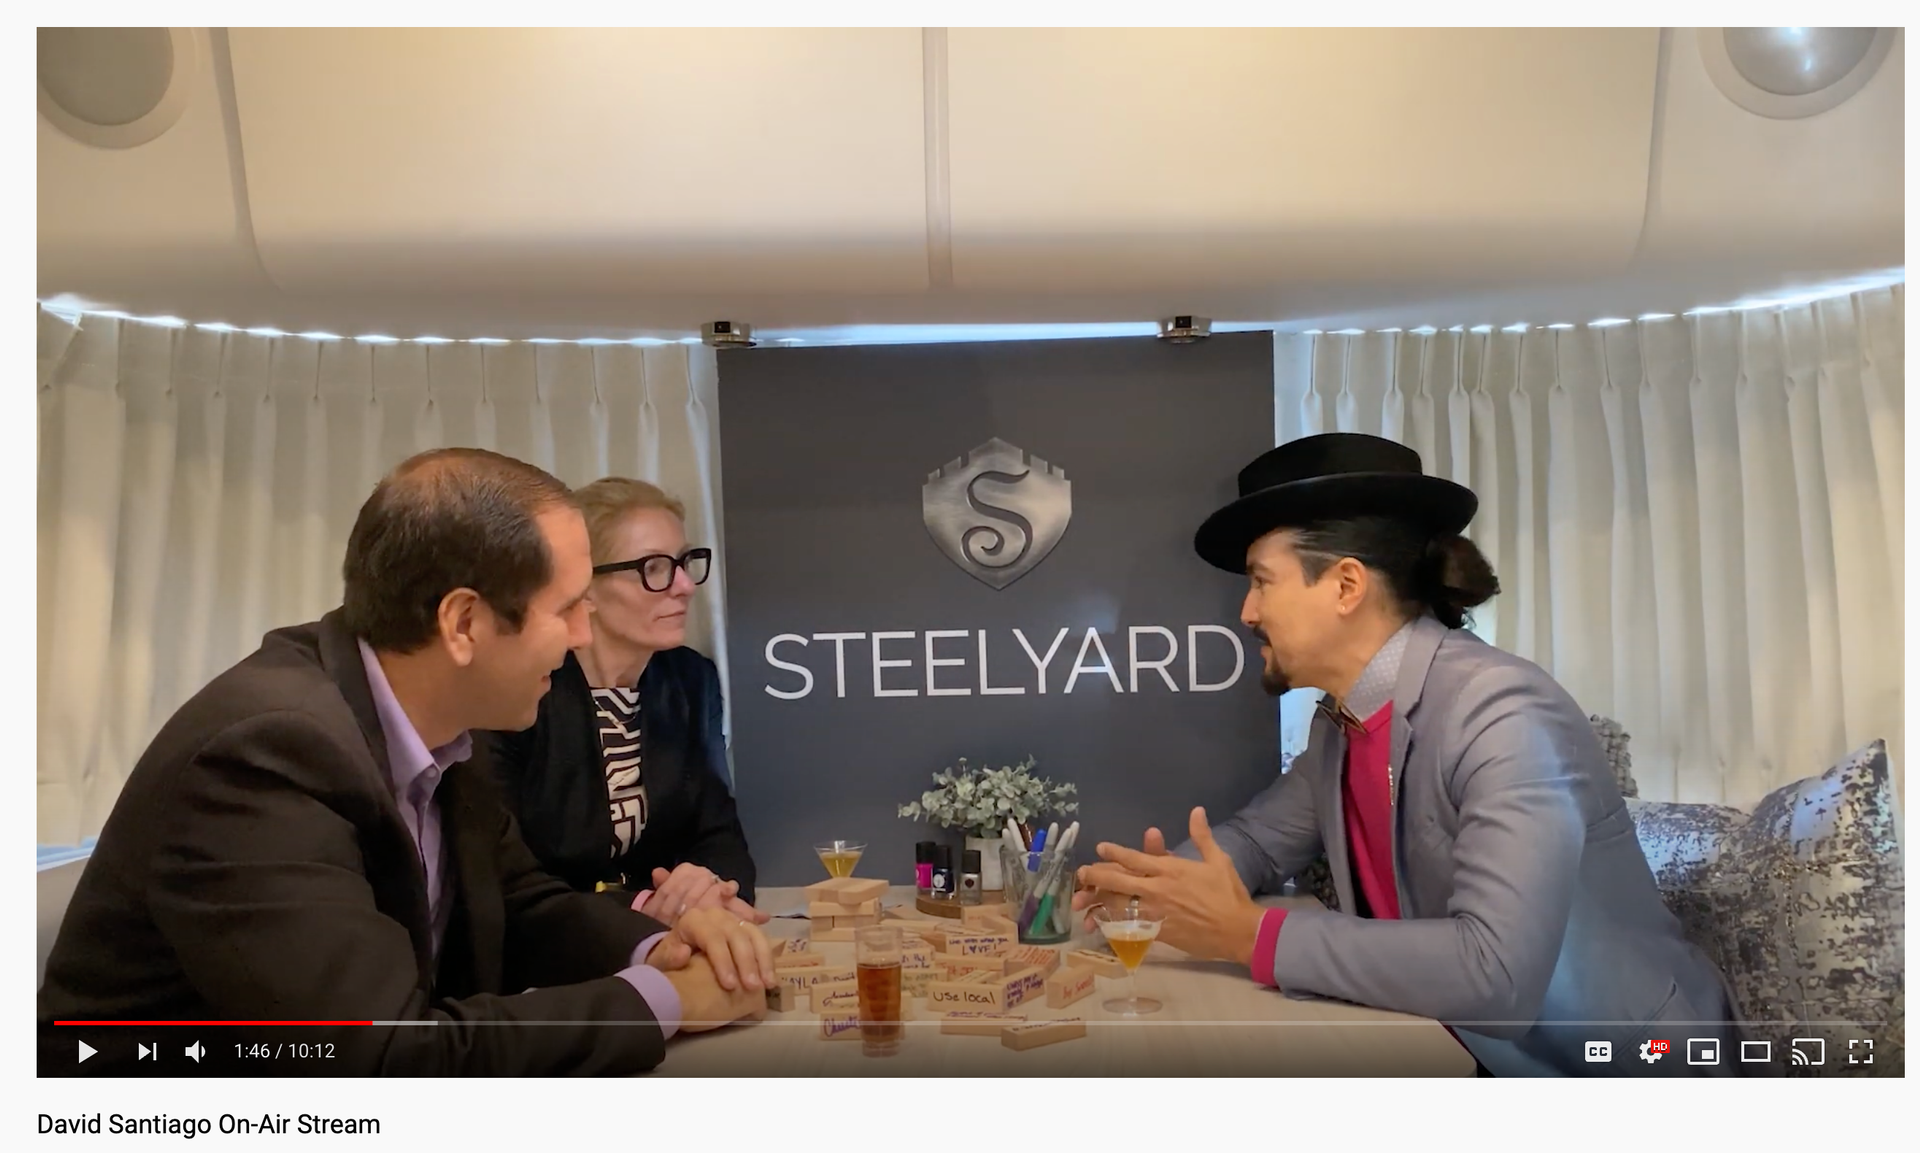 STEELYARD - David Santiago On-Air Stream